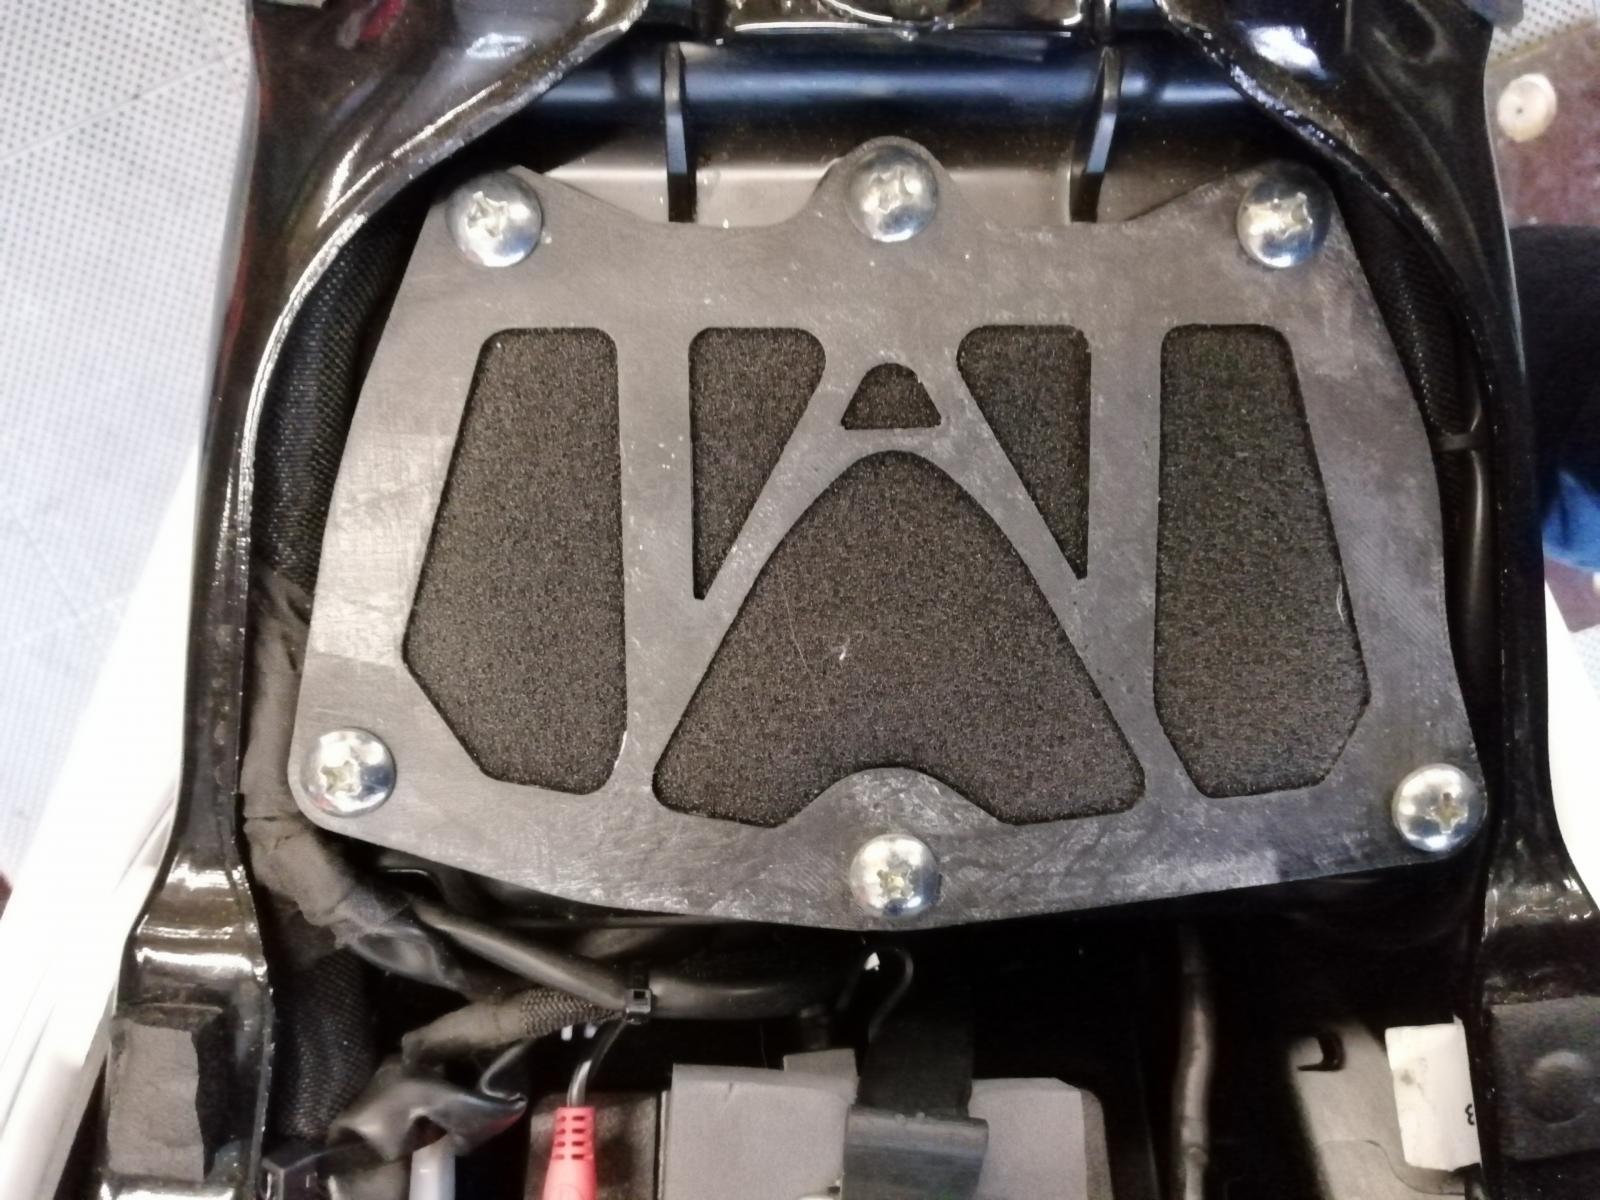 Exhaust and filter jobbie.-img_20190317_144845.jpg